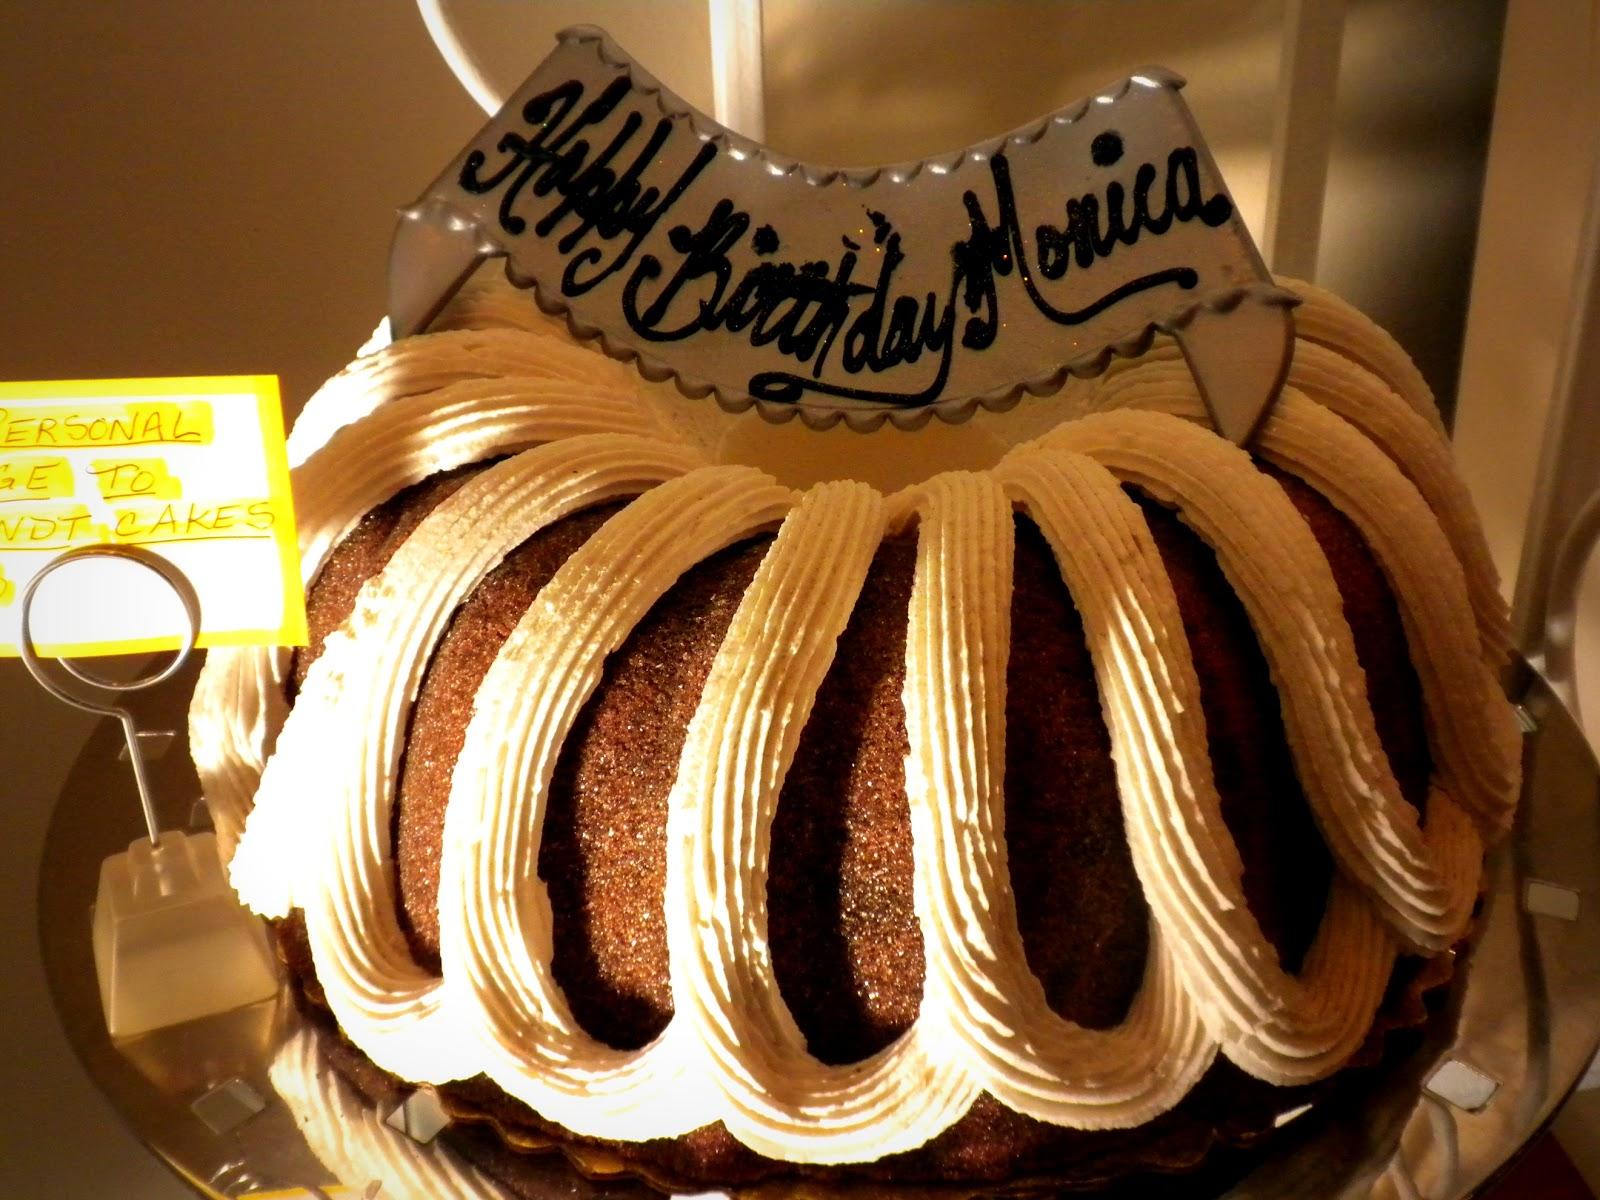 Ive Gotta Guy Monicas Bundt Cake Co